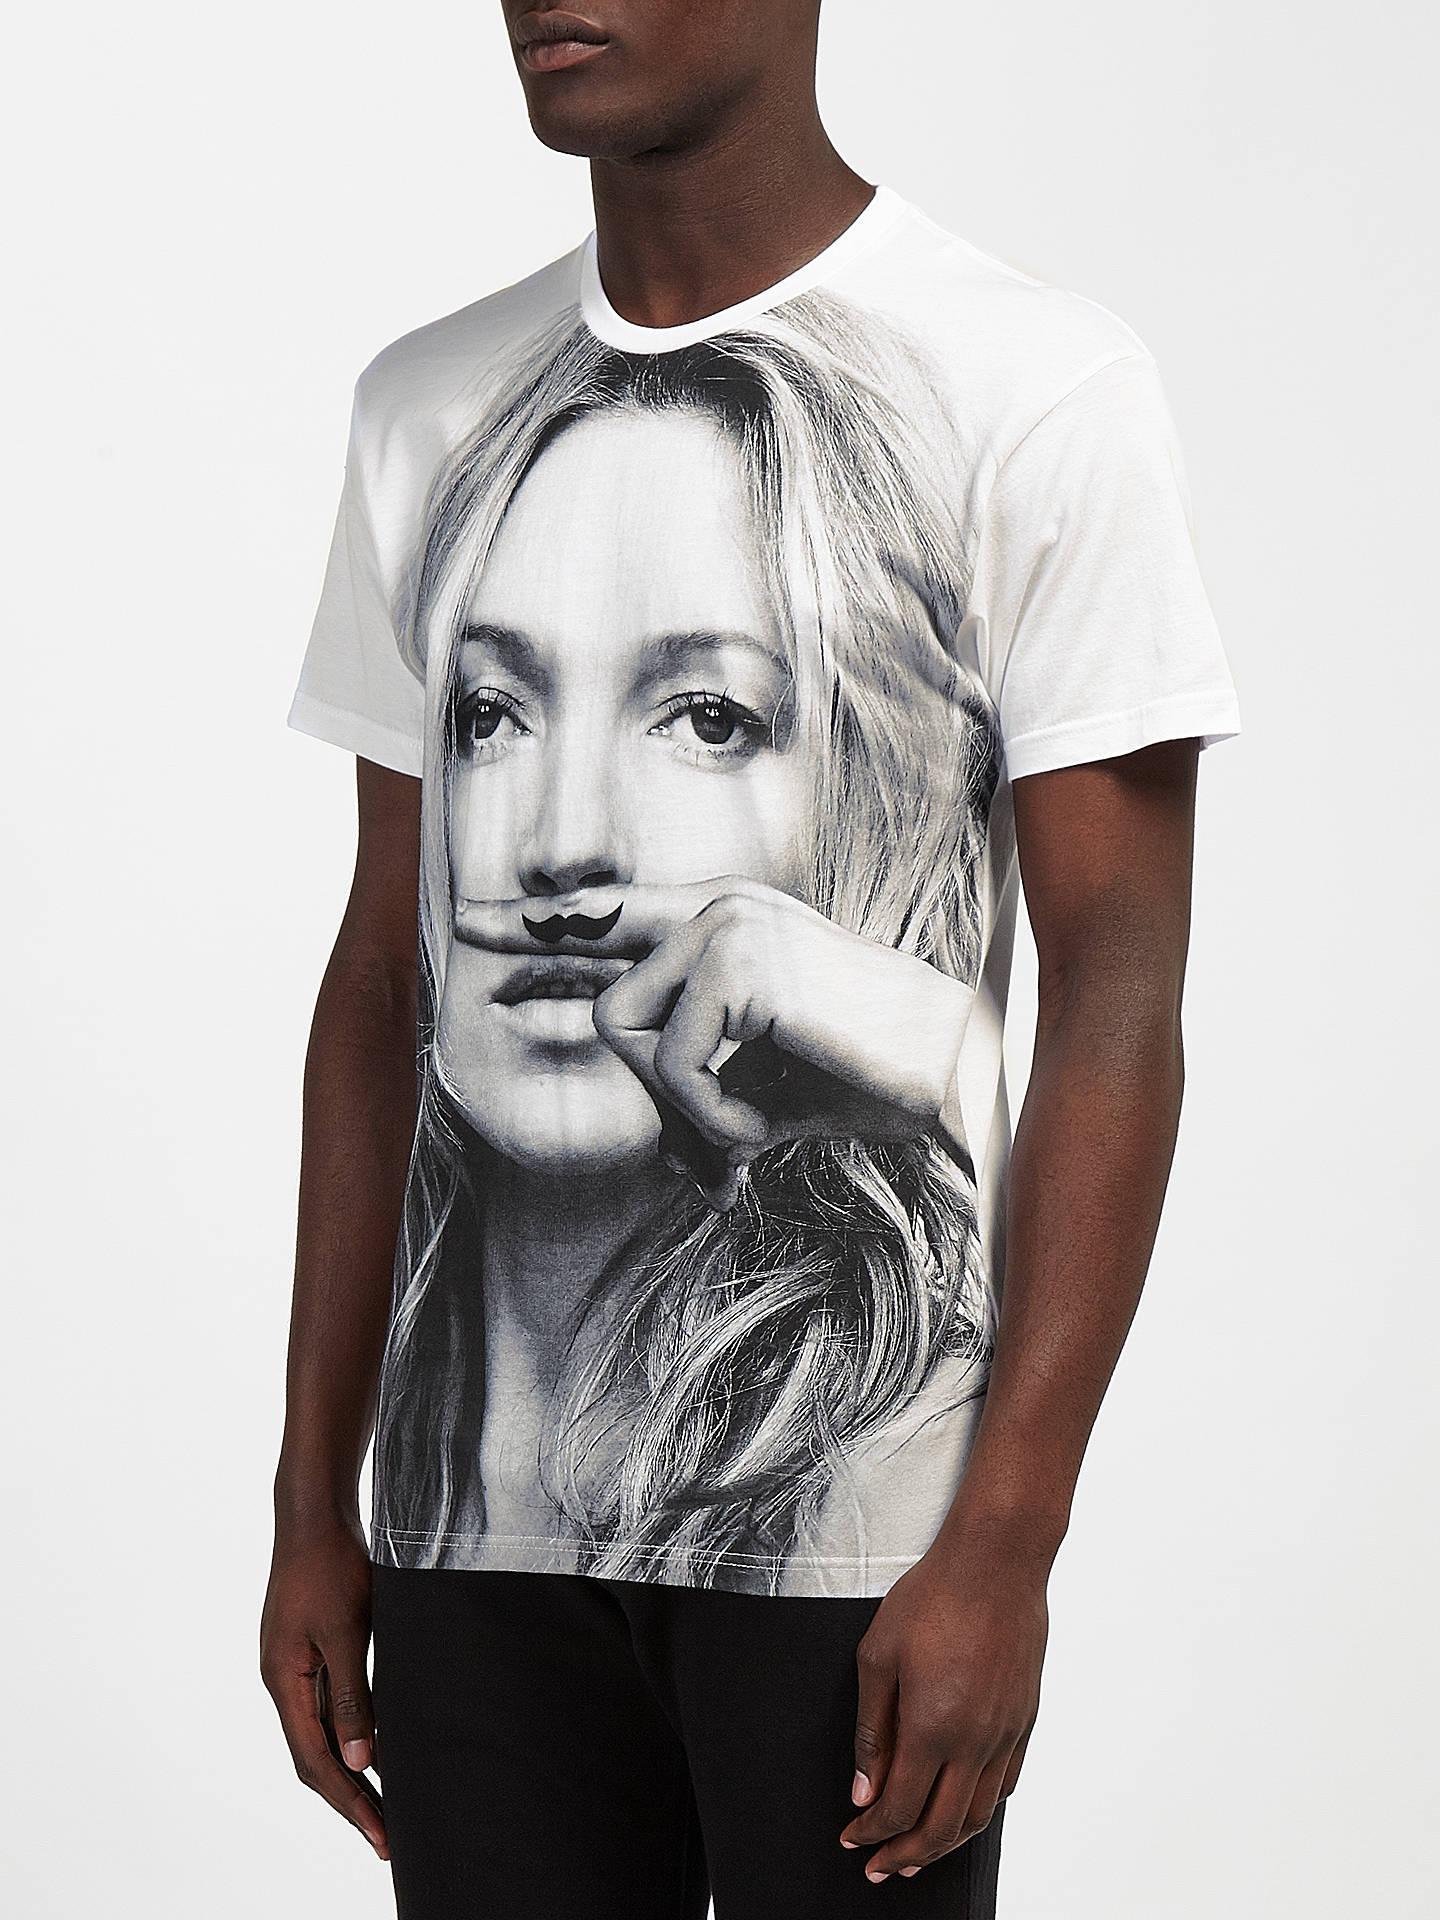 ca2513571 ... Buy Eleven Paris Kate Moss Moustache T-Shirt, White, S Online at  johnlewis ...